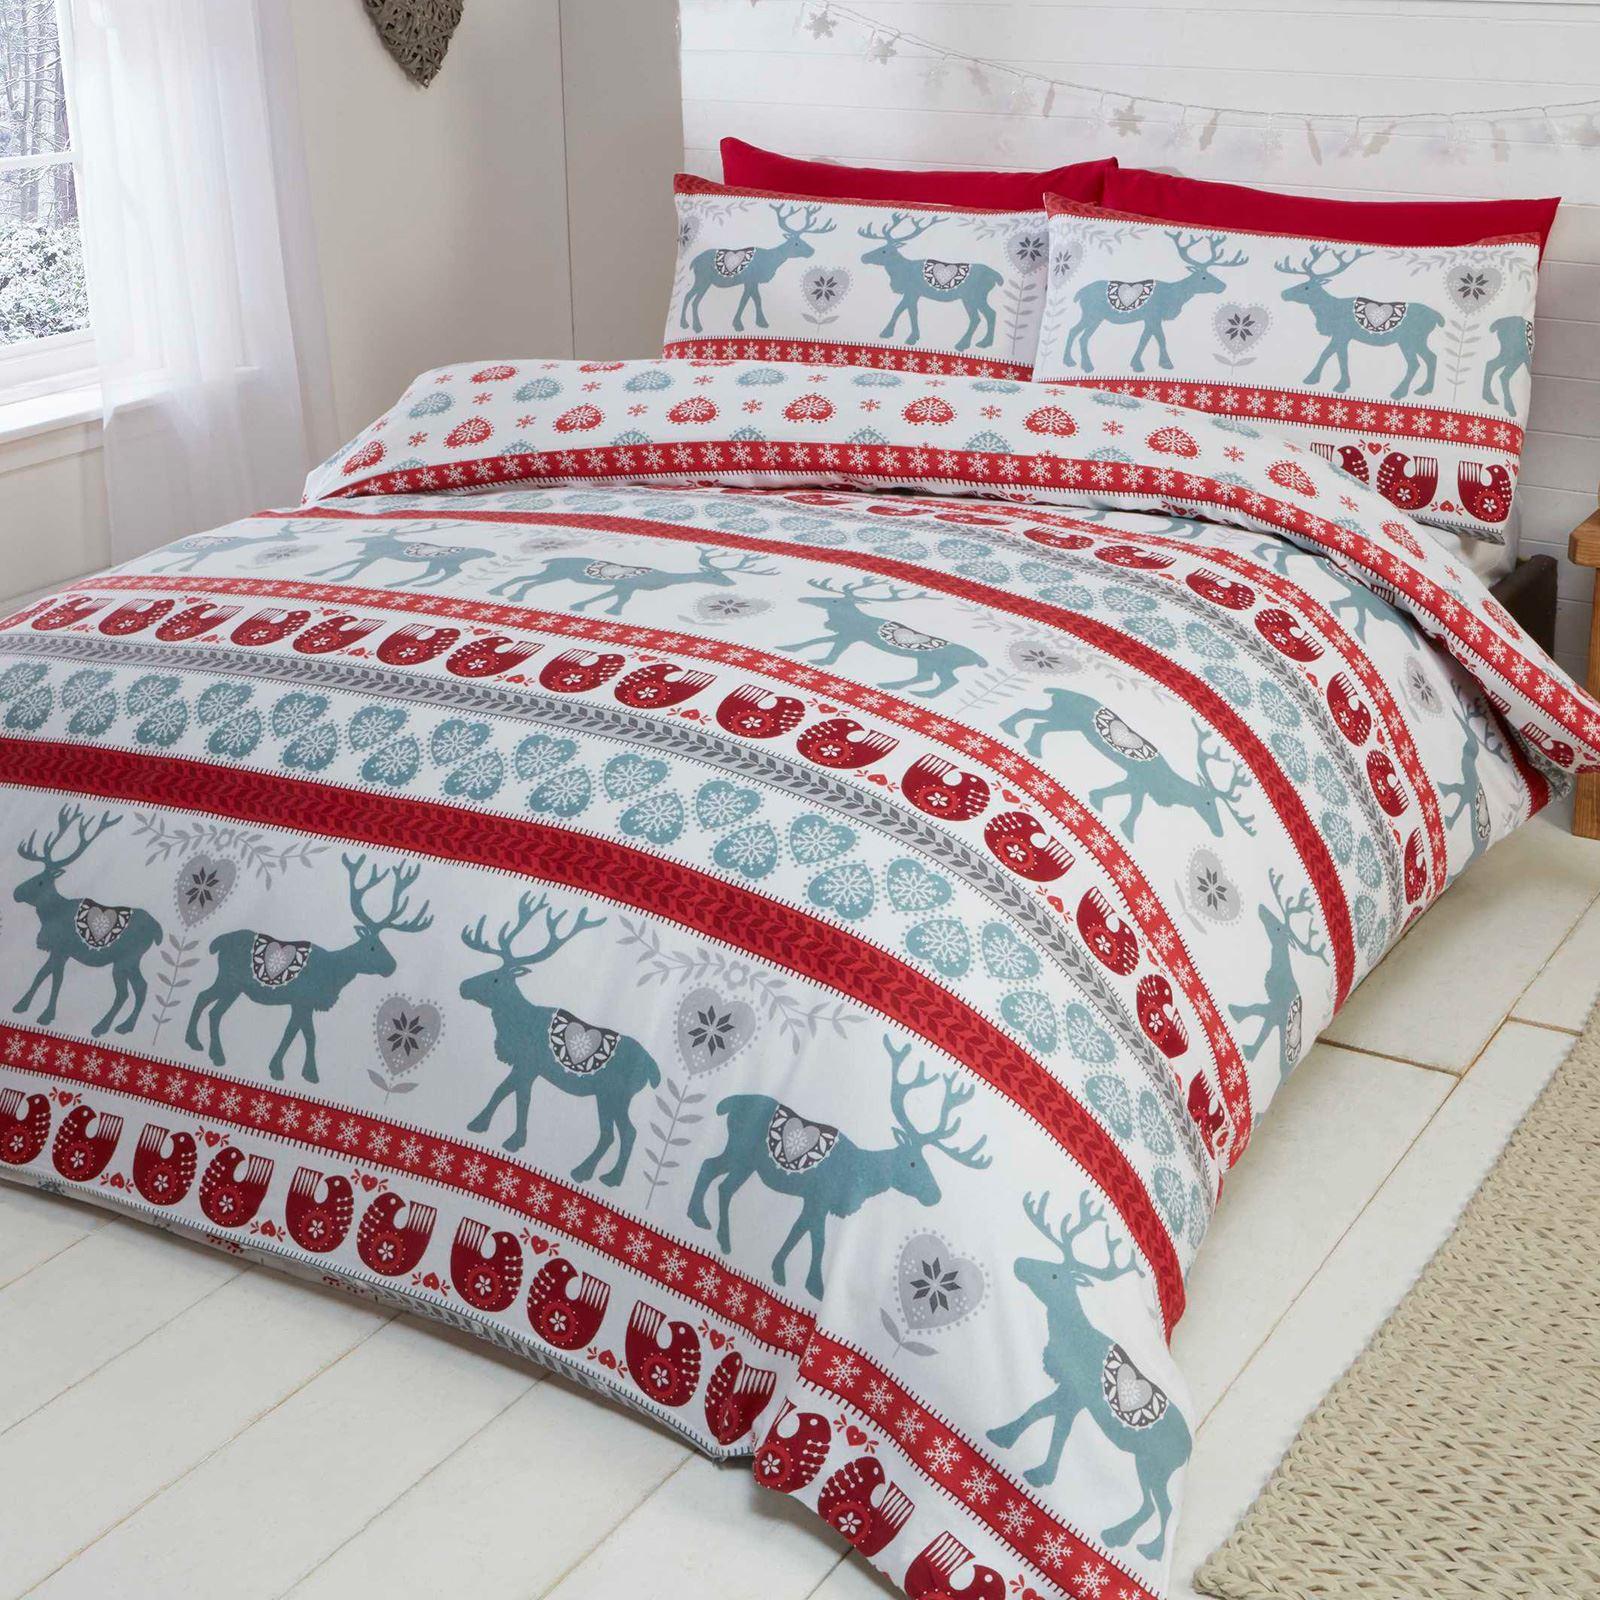 Christmas Festive Duvet Cover Sets Bedding Adults